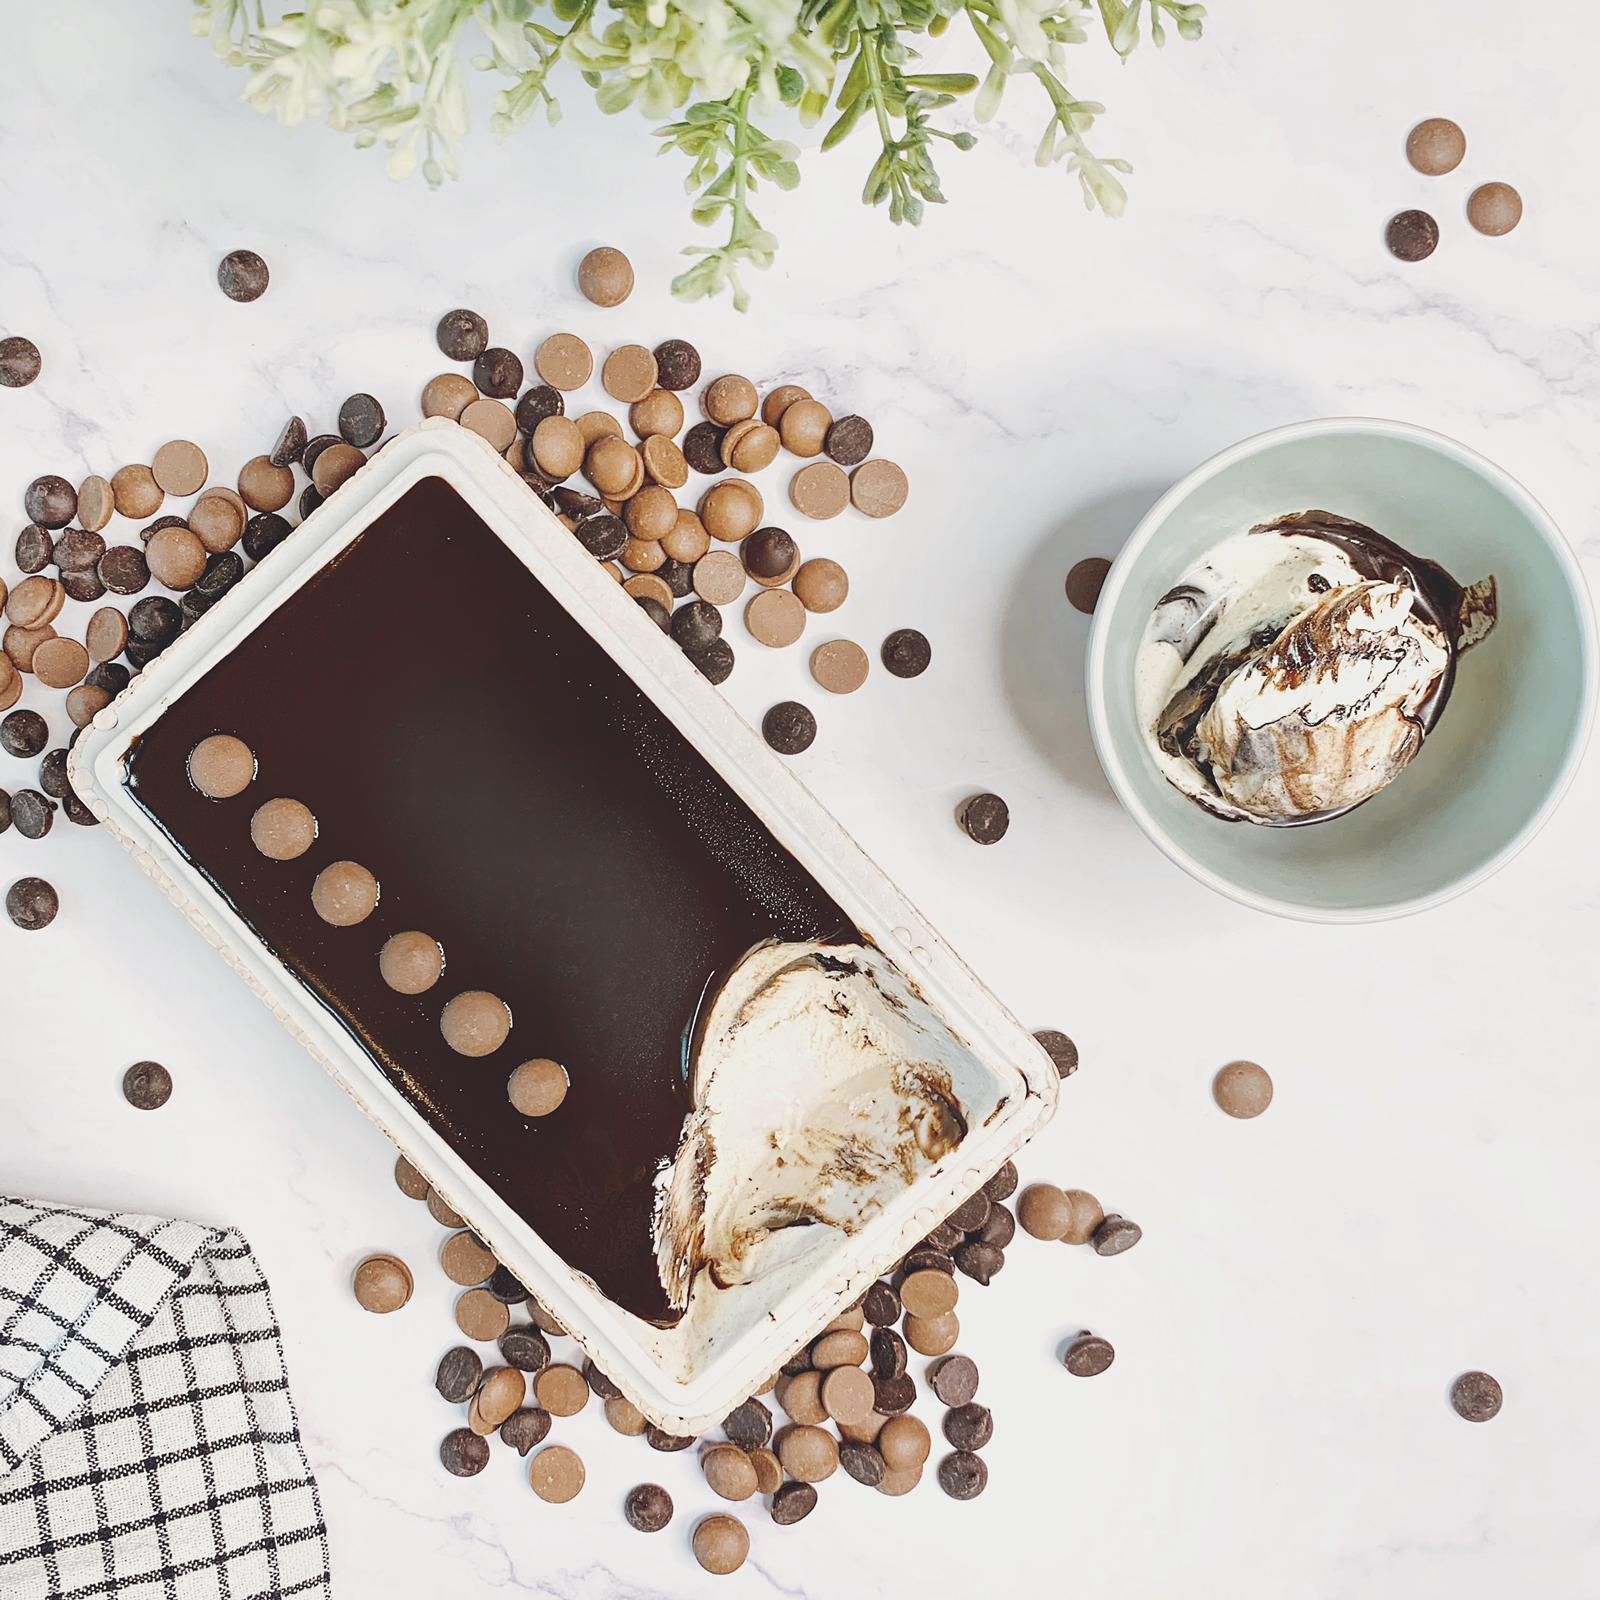 Cremoloso gelato chocolate layer